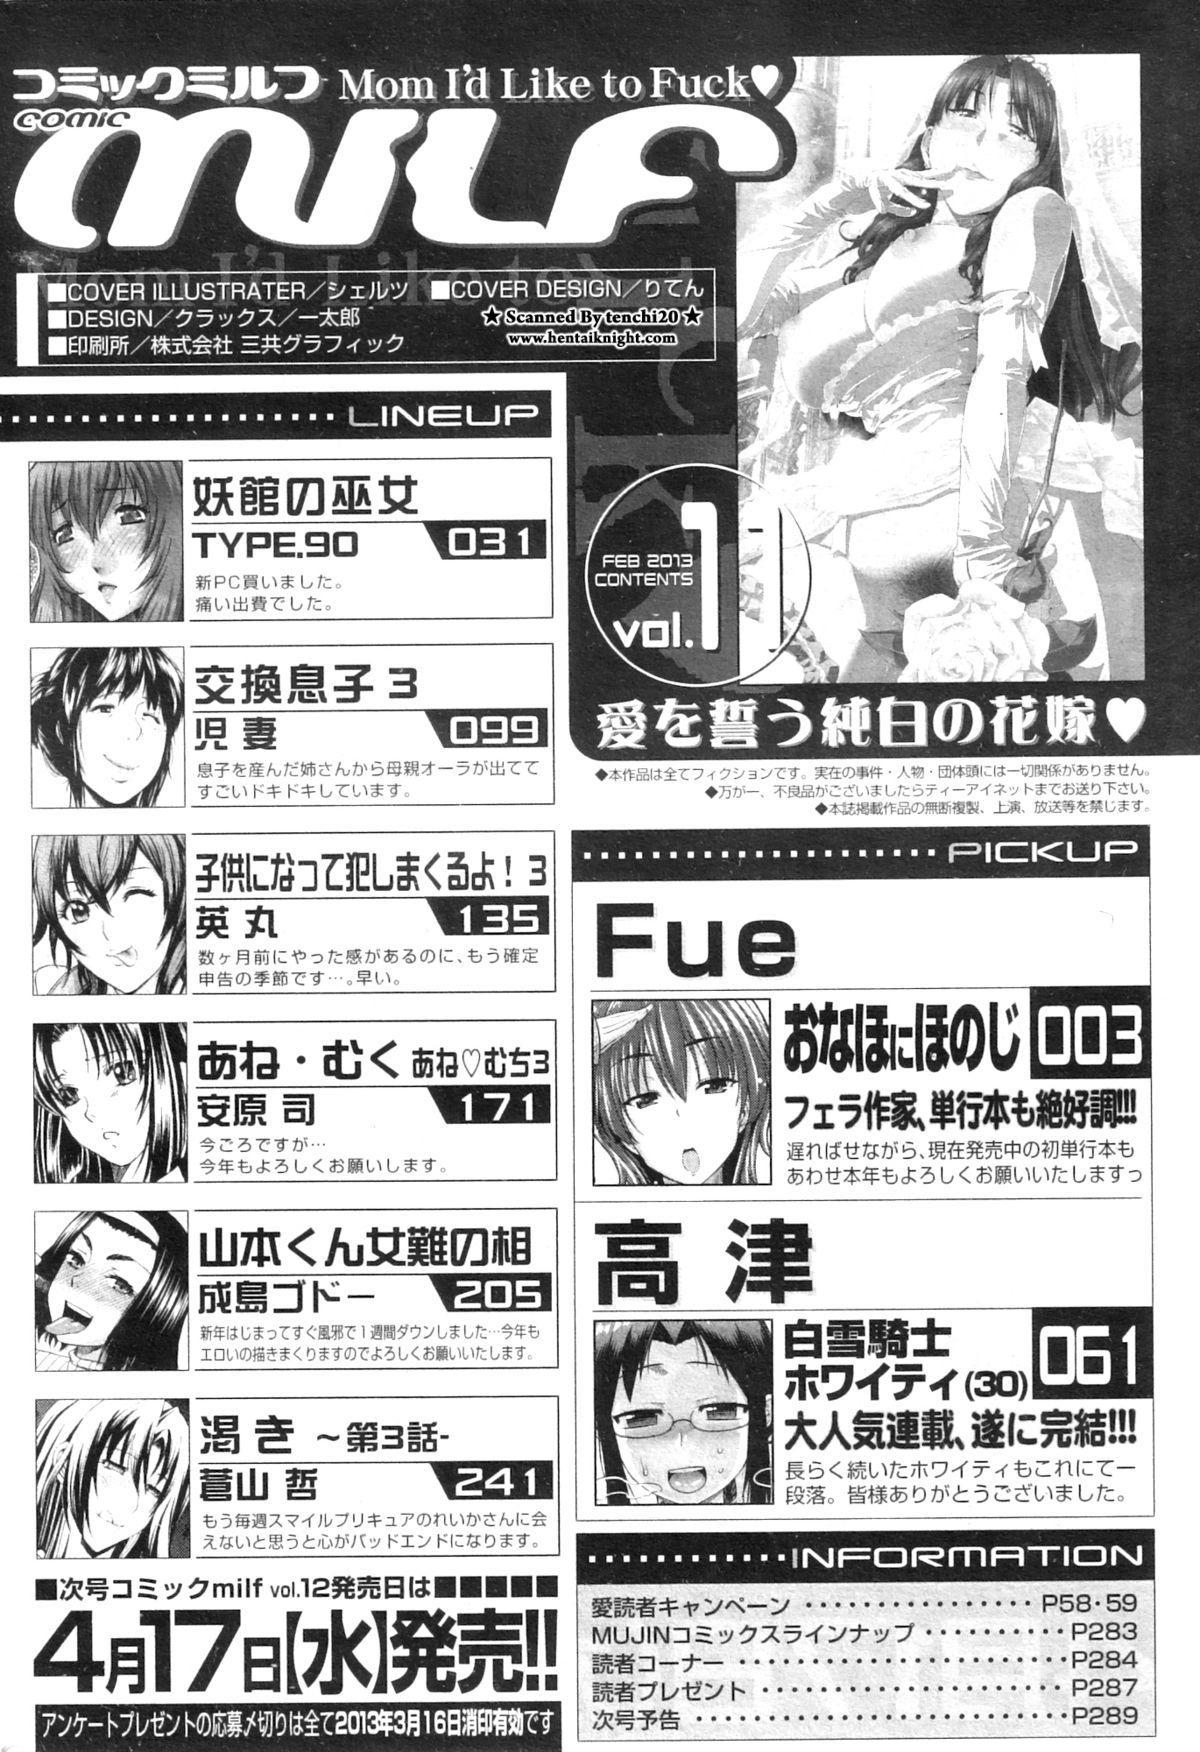 COMIC MILF 2013-02 Vol. 11 298